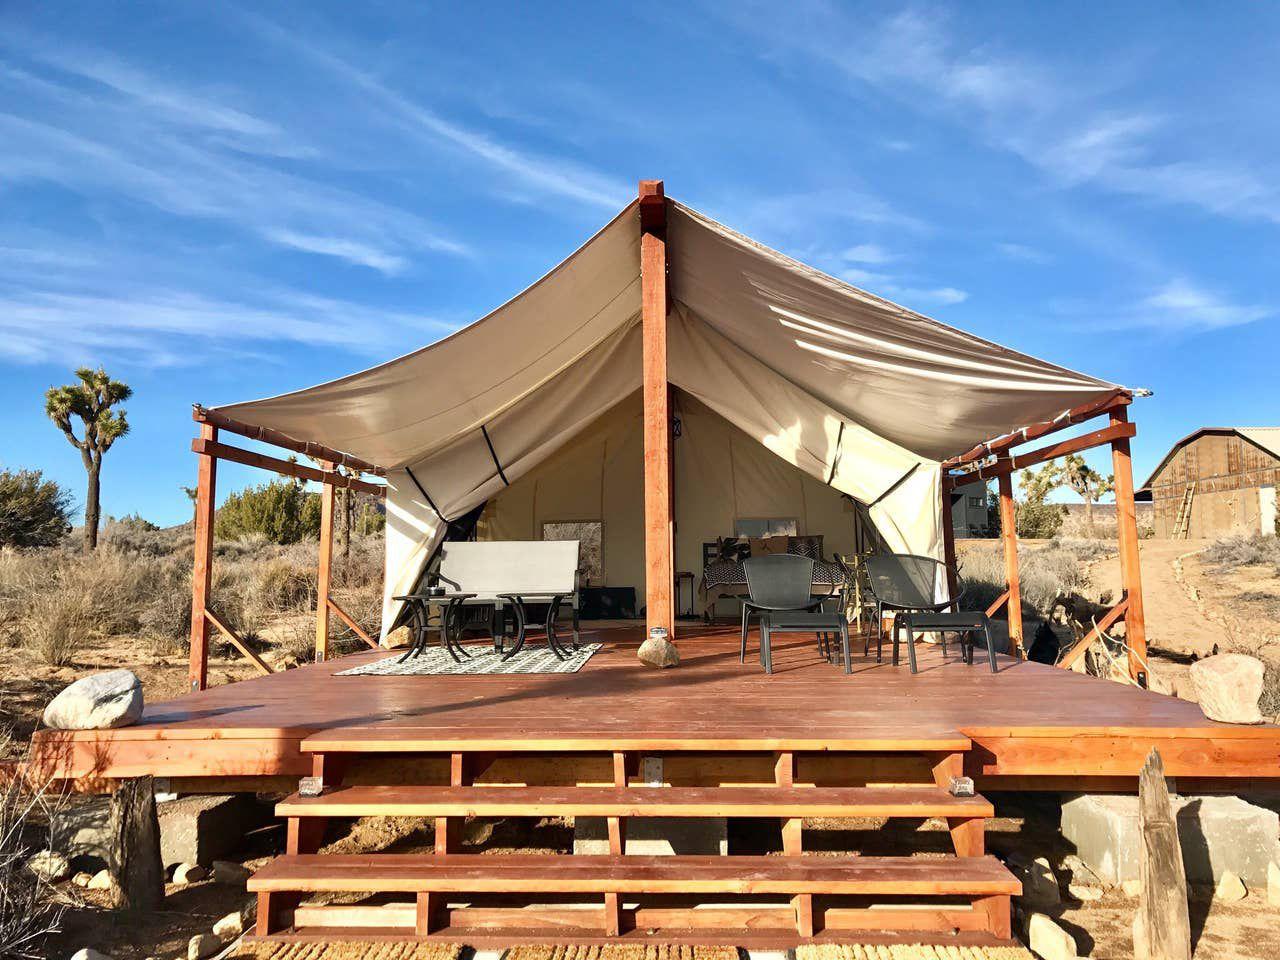 Cultus Camp - Joshua Tree Airbnb